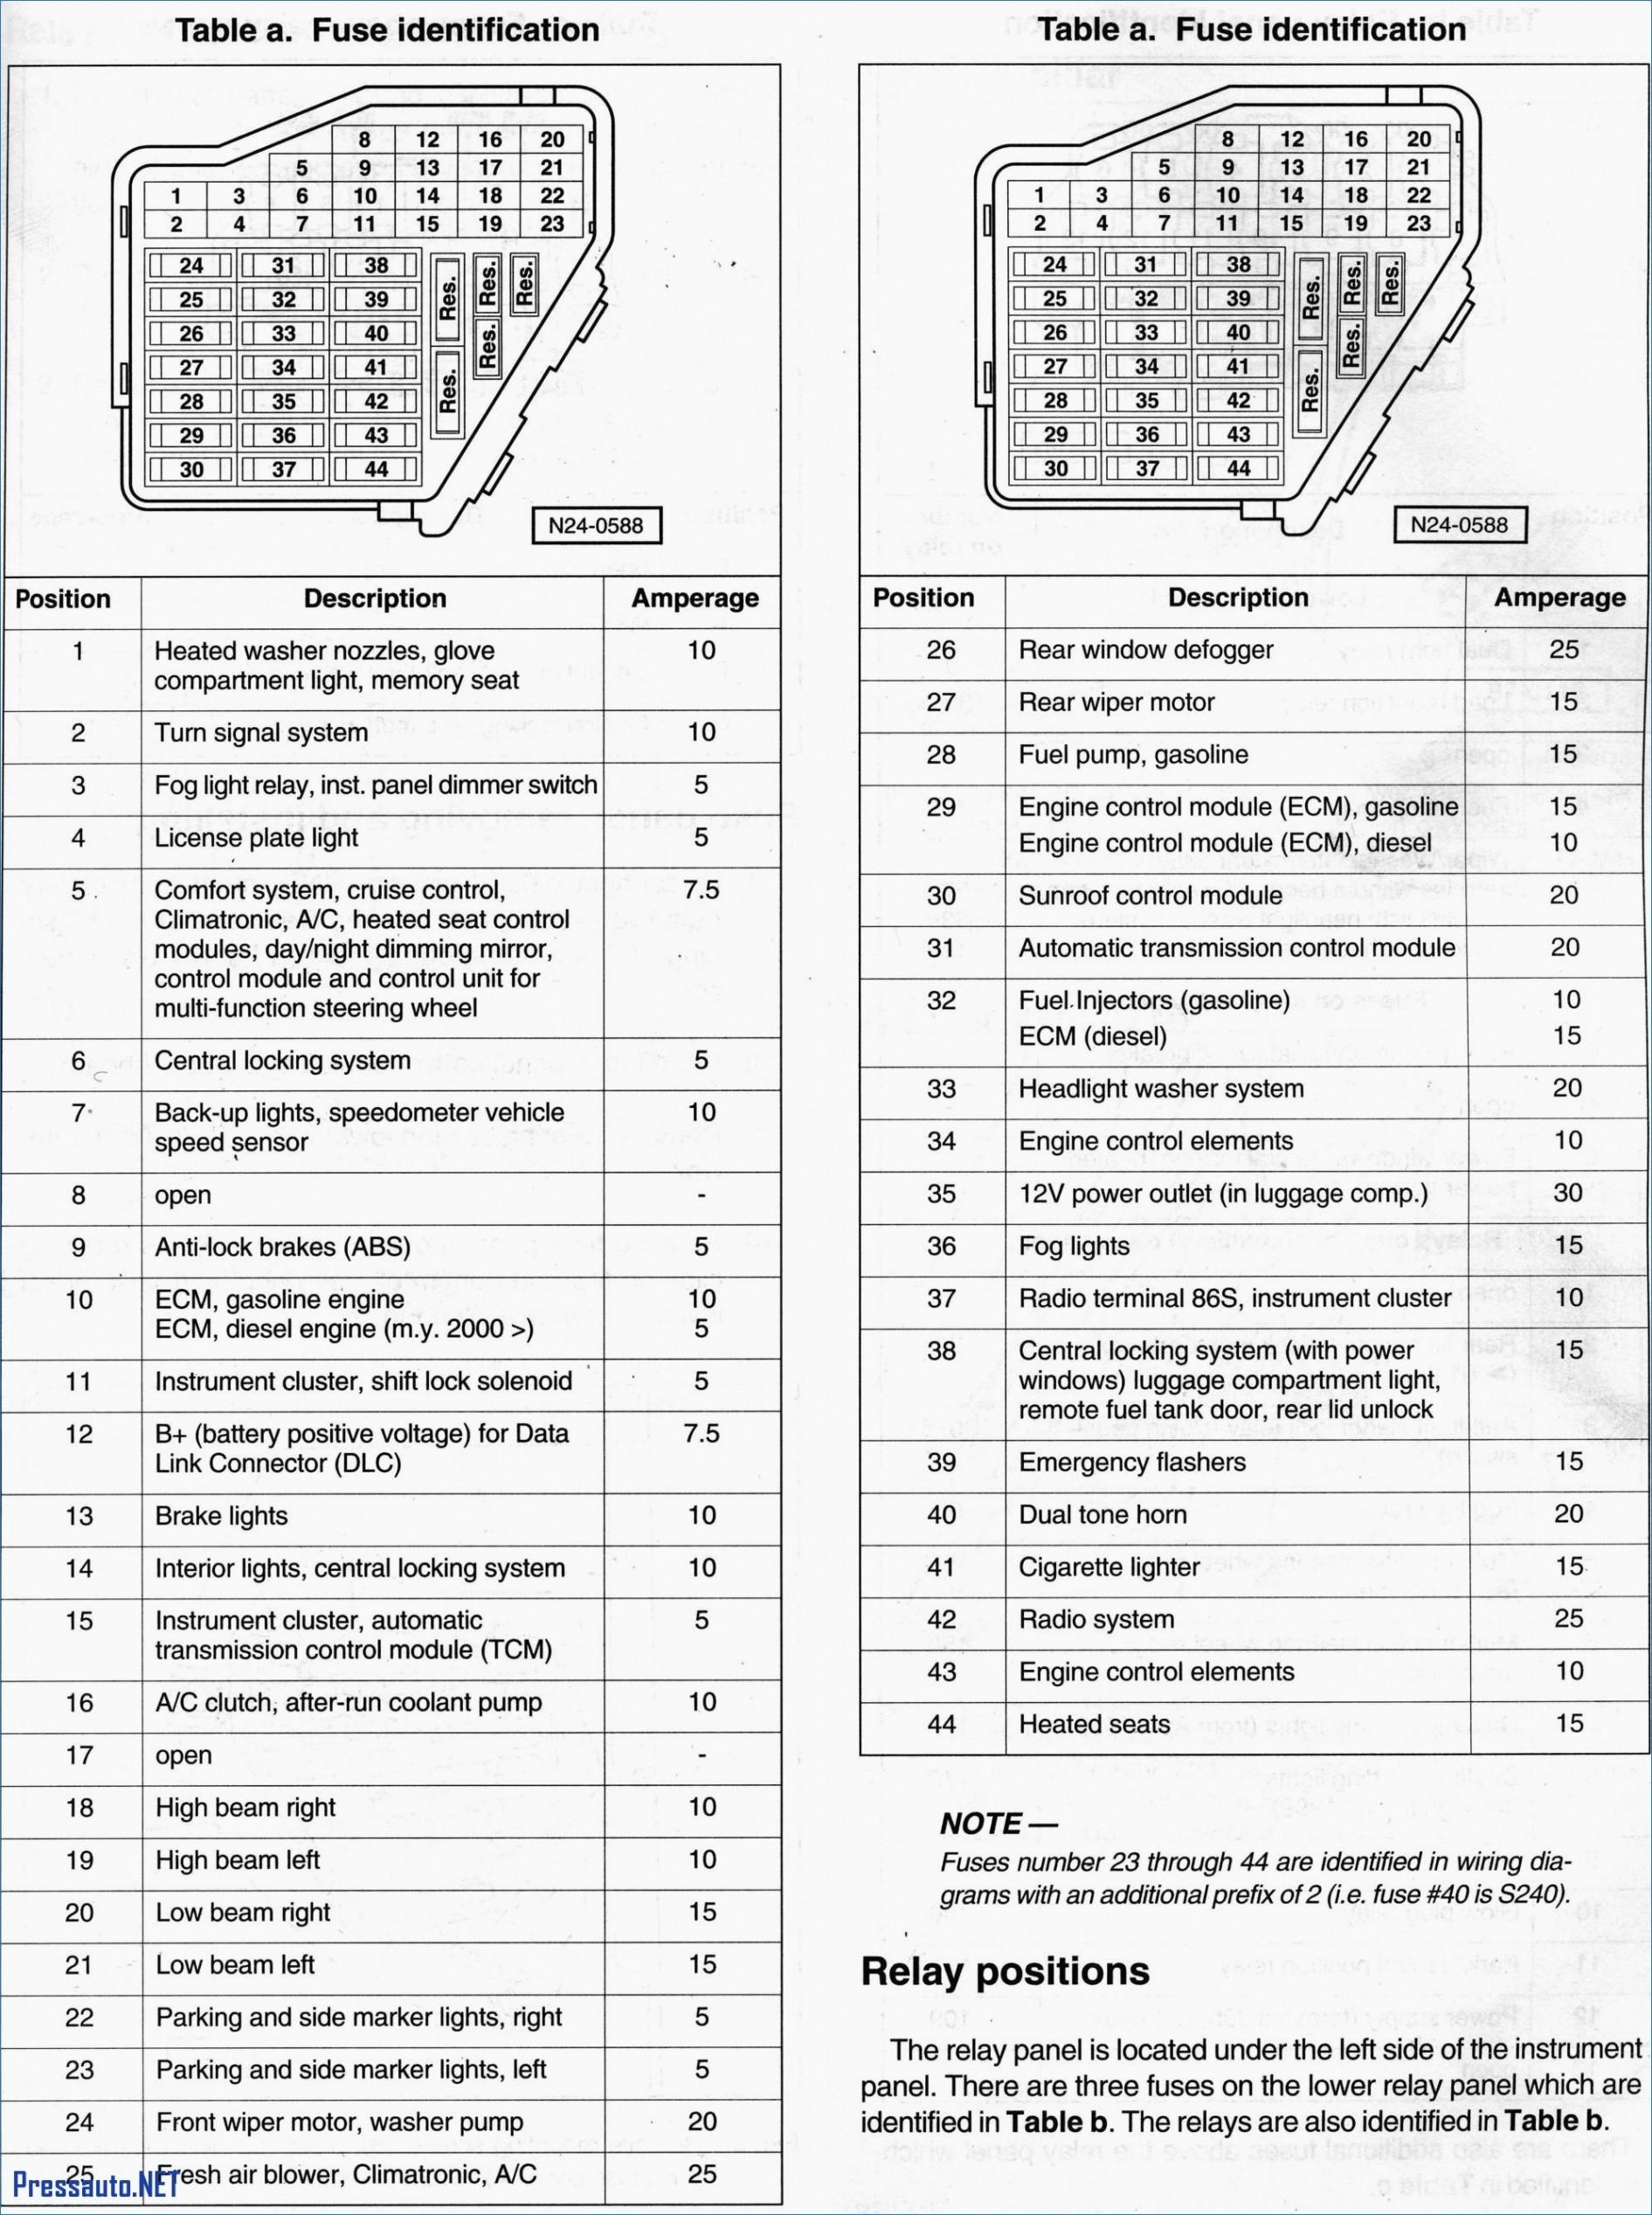 Surprising 03 Audi A4 Fuse Box Wiring Schematic Diagram 28 Beamsys Co Wiring Cloud Intelaidewilluminateatxorg